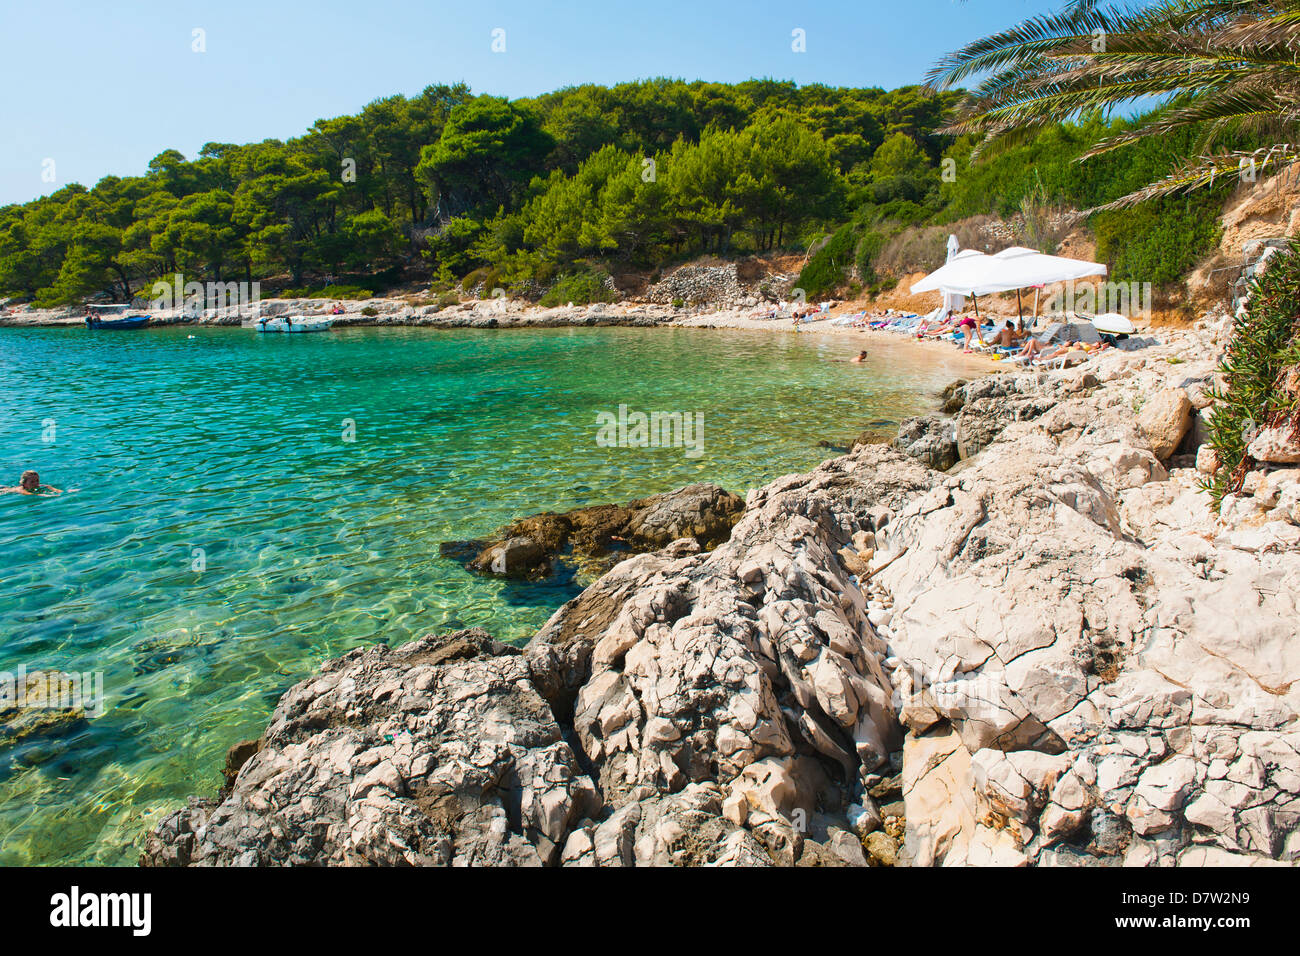 Beach in the Pakleni Islands (Paklinski Islands), Dalmatian Coast, Adriatic Sea, Croatia - Stock Image